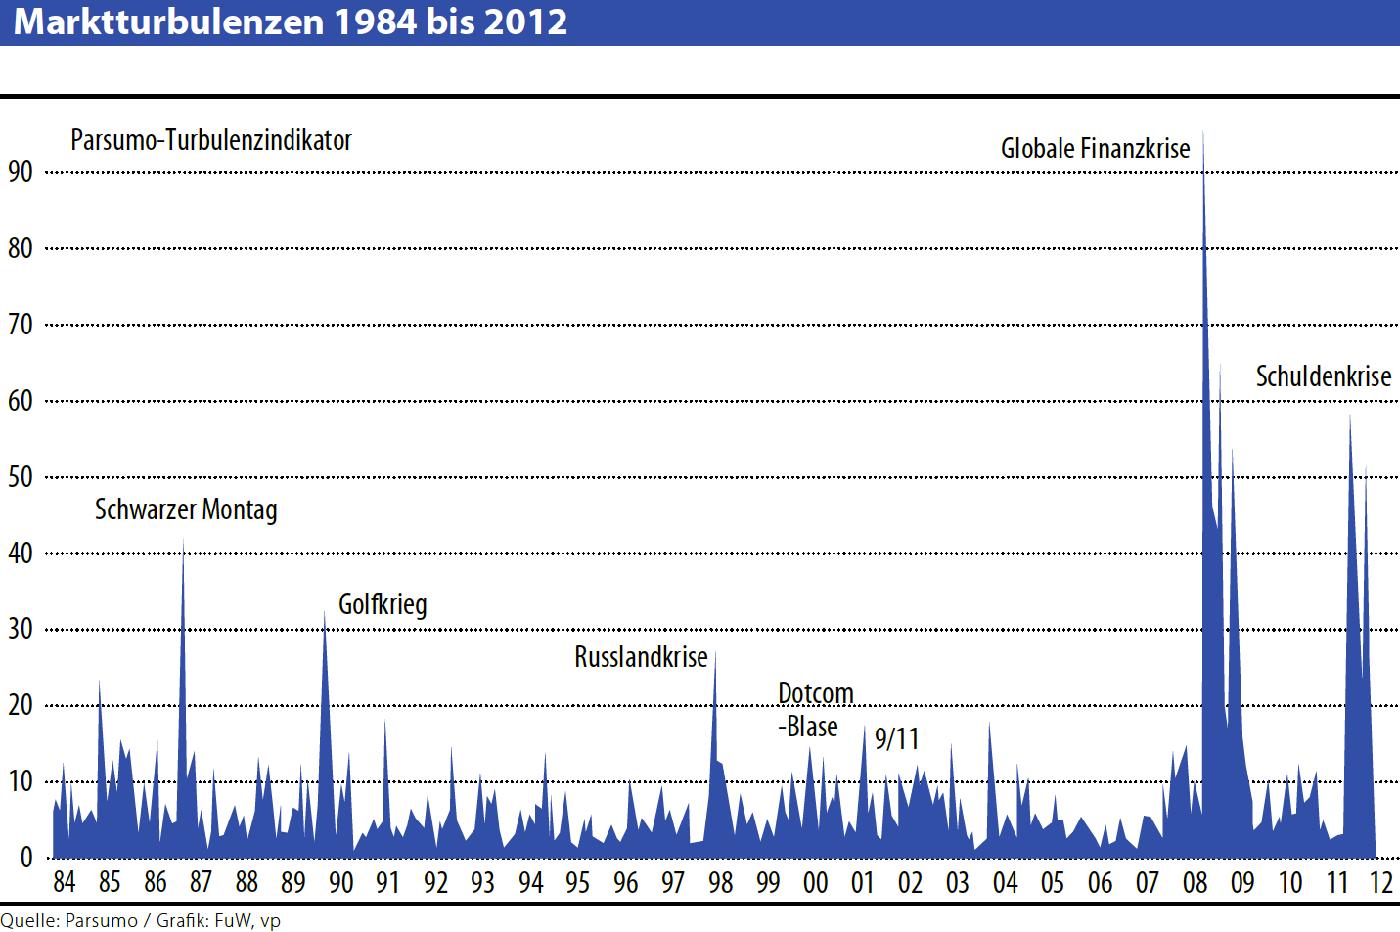 marktturbulenzen-1984-bis-2012-parsumo-capital-ag